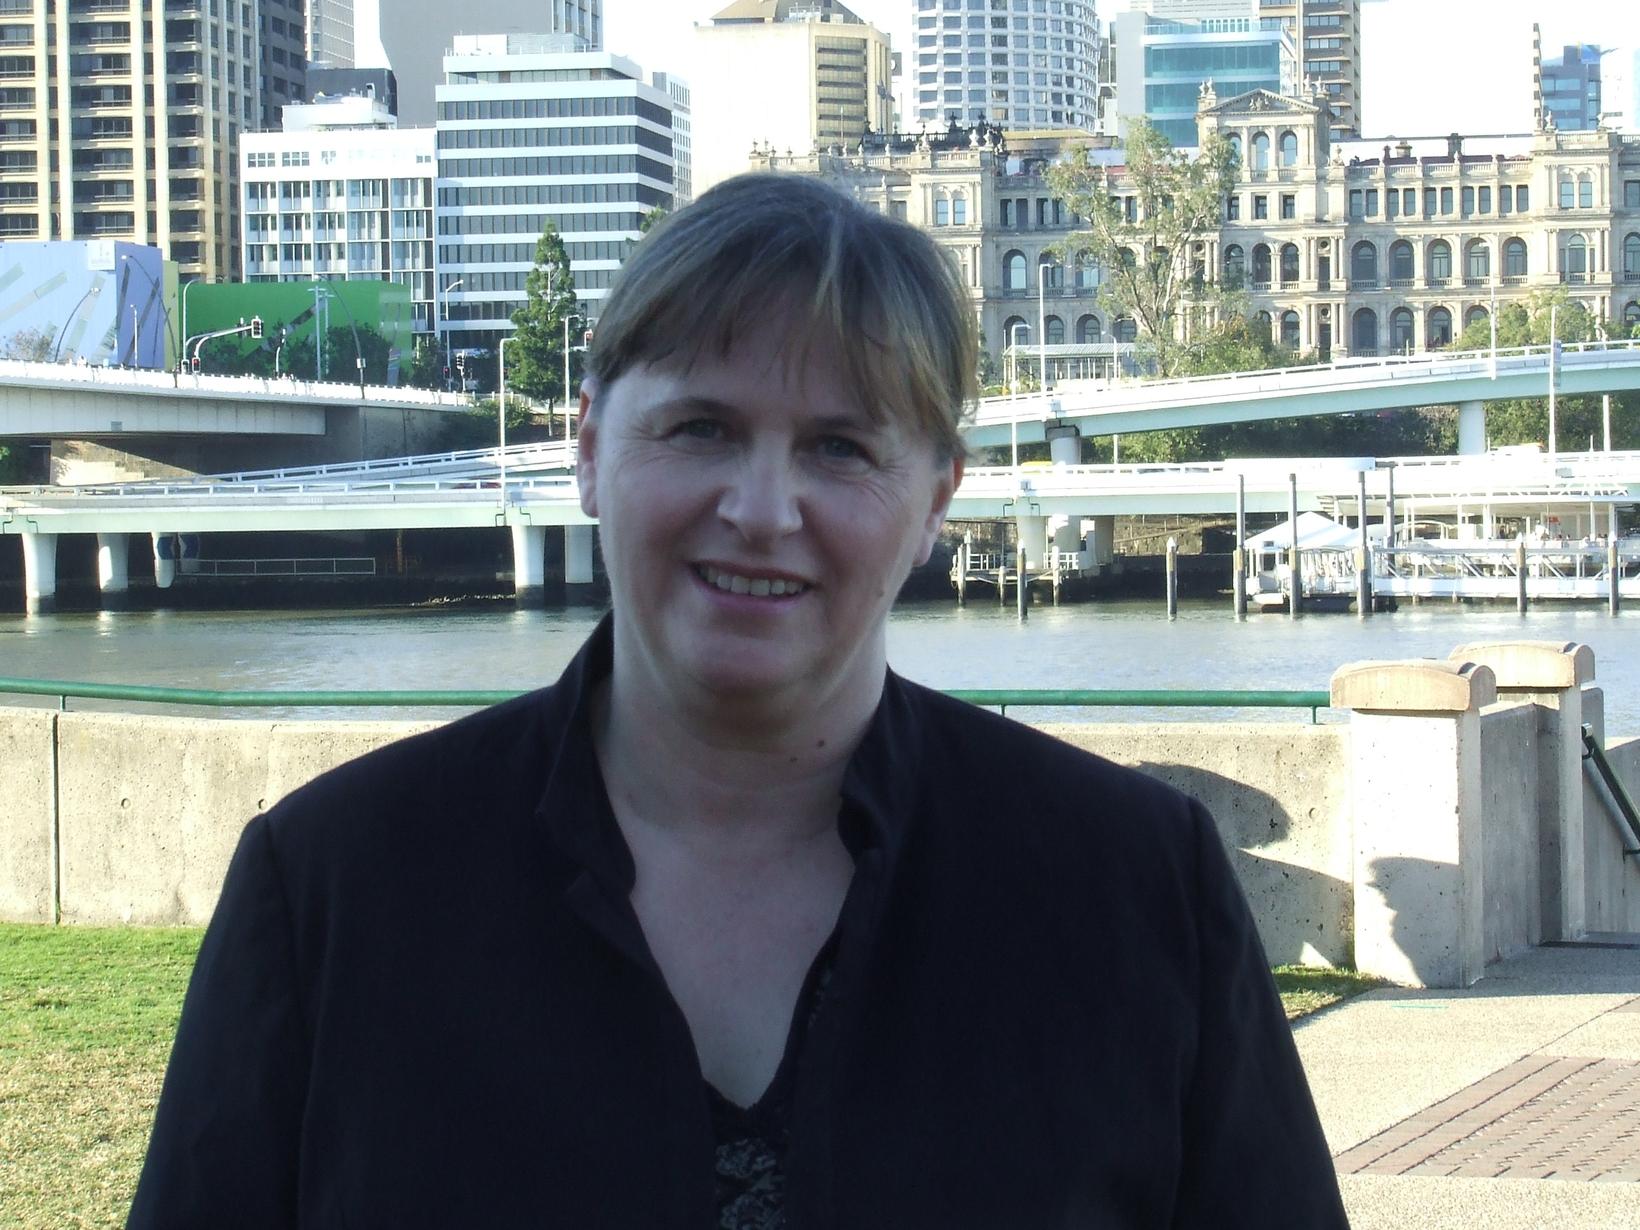 Doris from Sydney, New South Wales, Australia